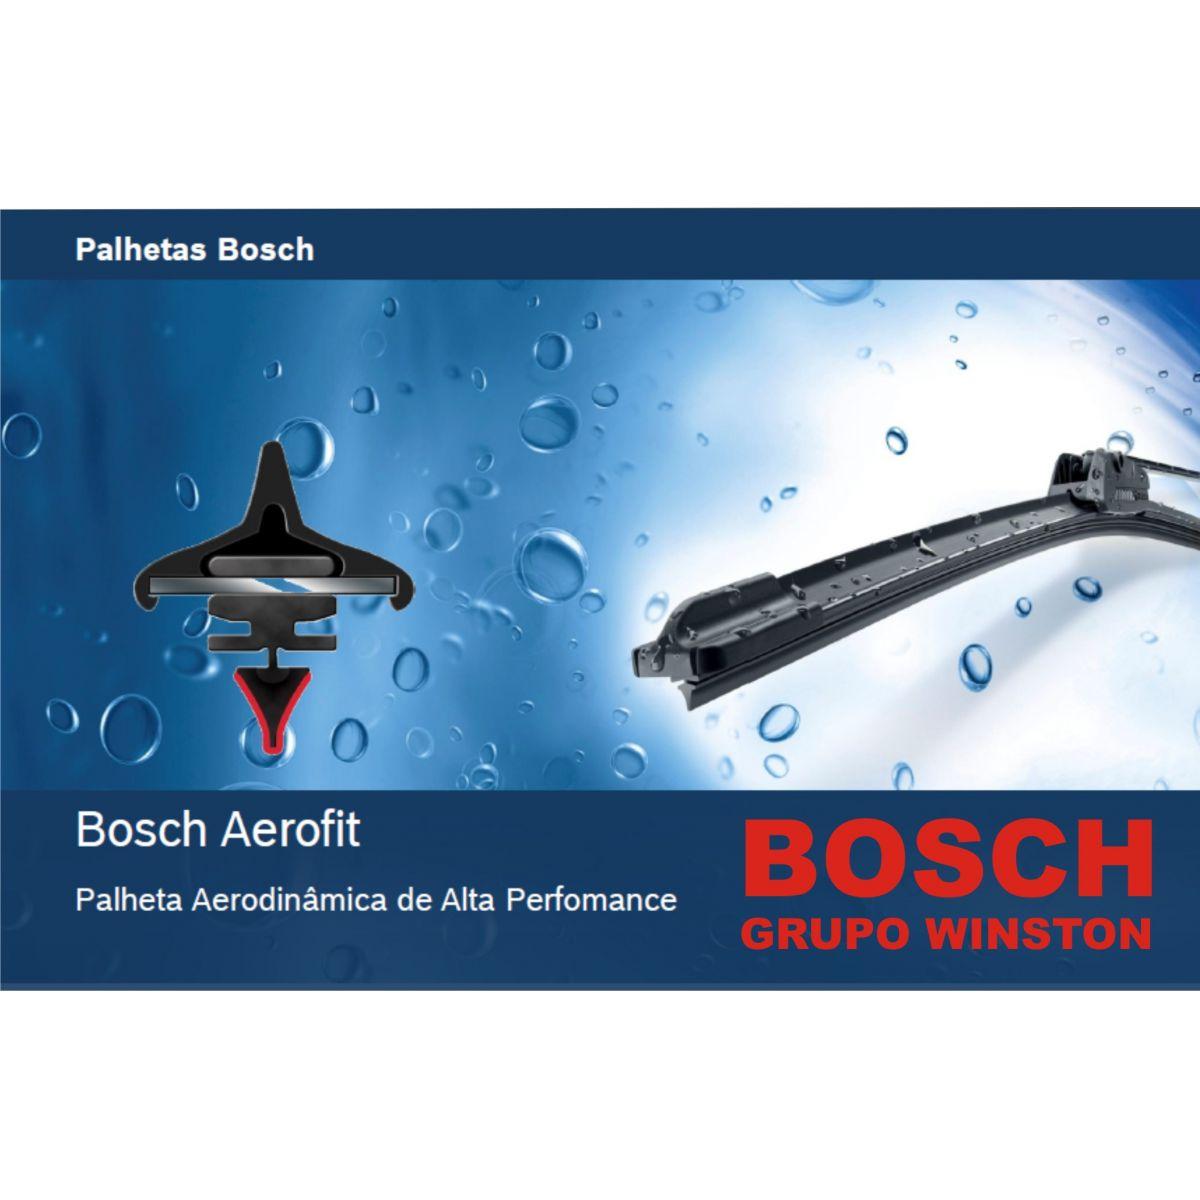 Palheta Bosch Aerofit Limpador de para brisa Bosch FORD EcoSport Fiesta II Fiesta Sedan II